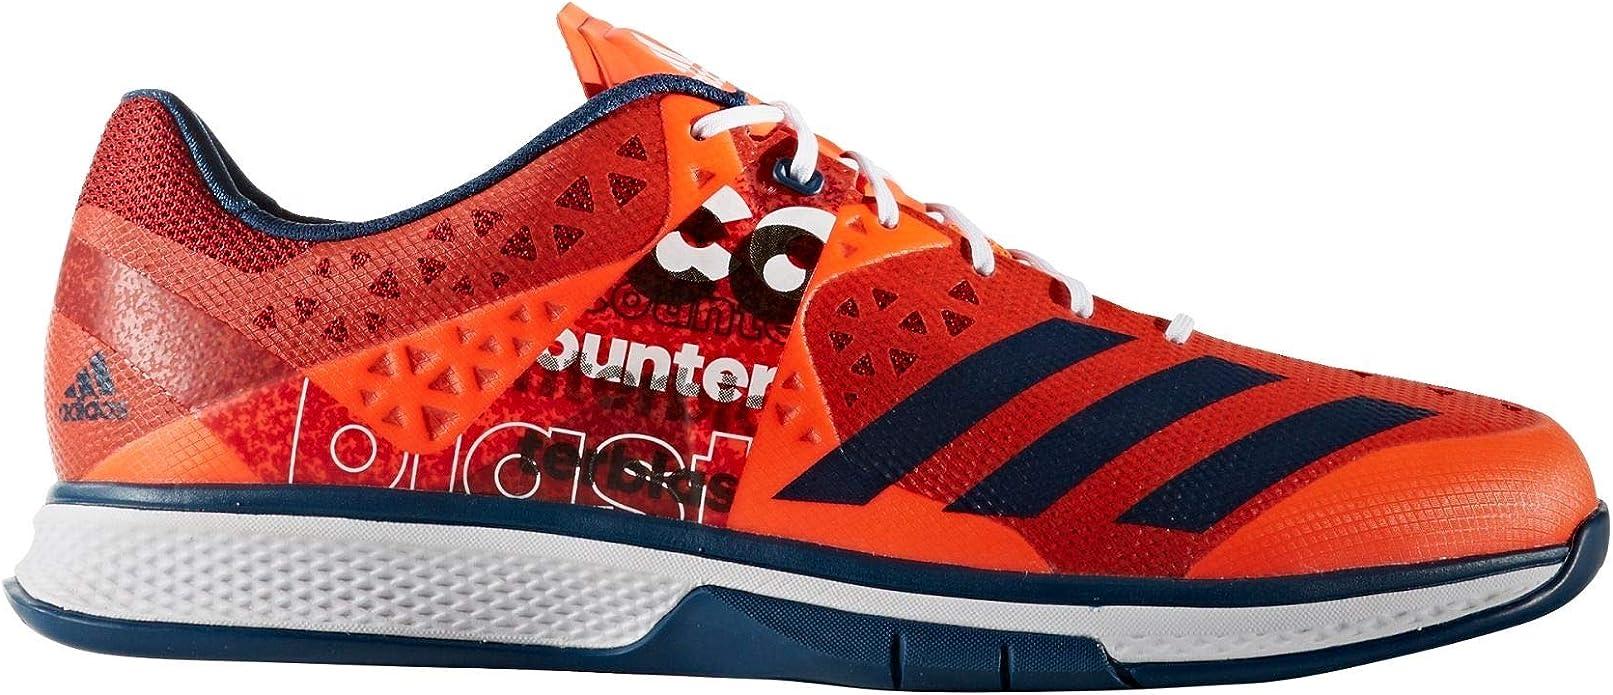 Adidas Counterblast Falcon Men's